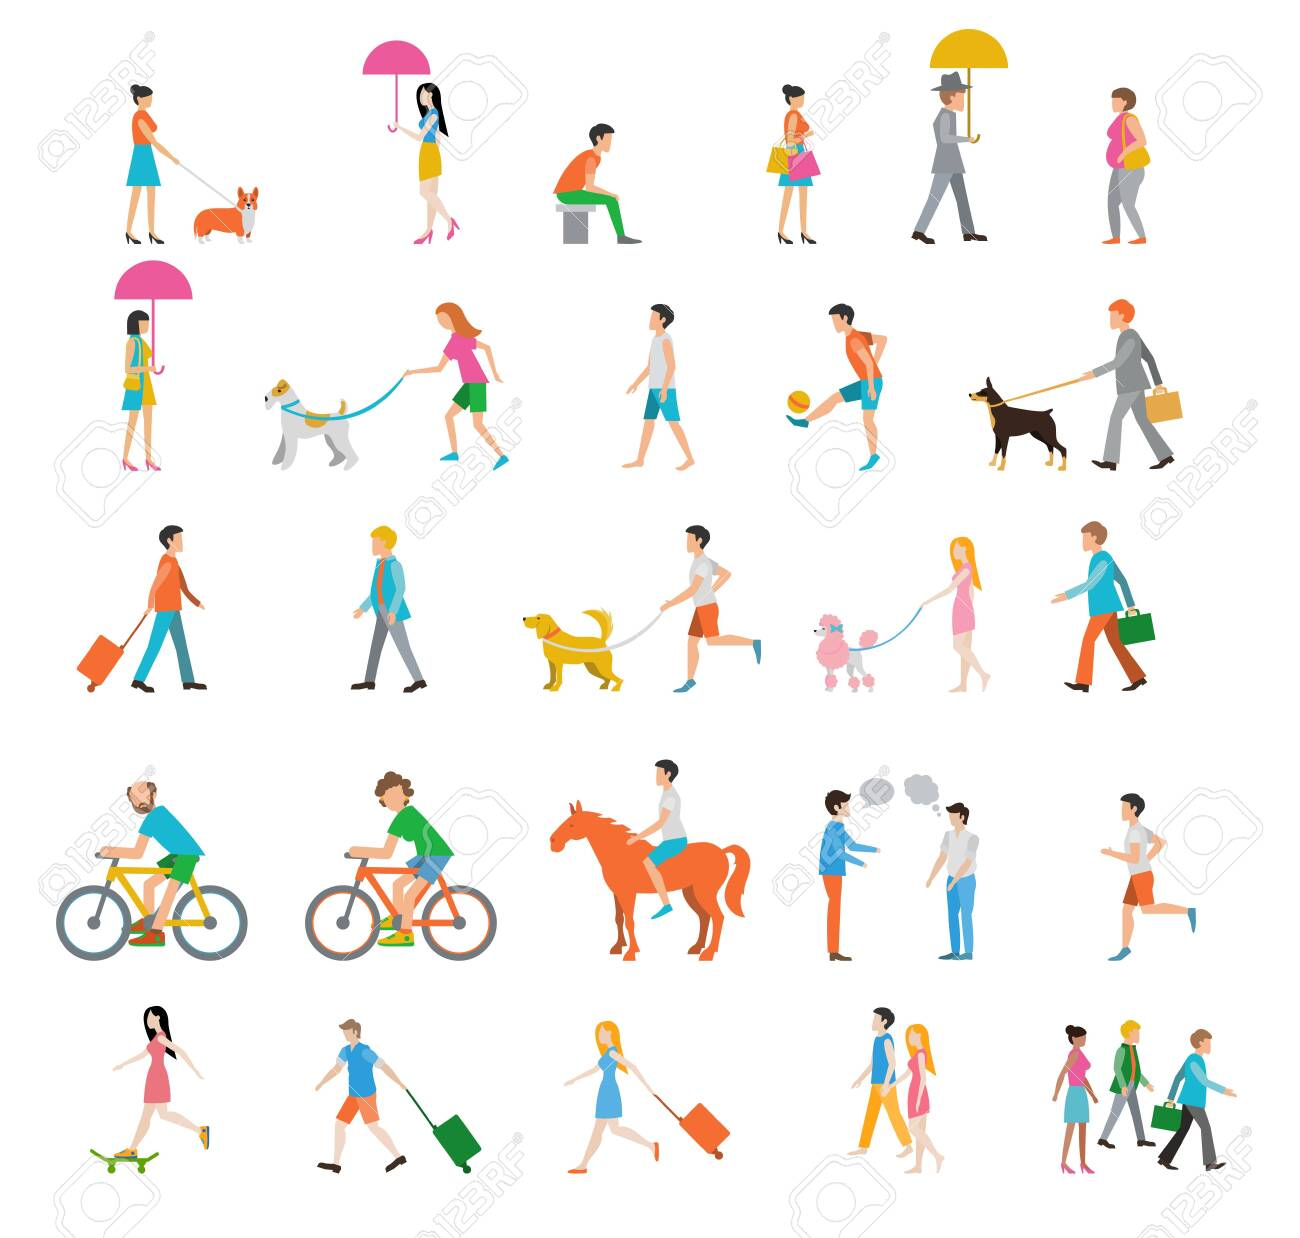 People on the street. Neighbors. Flat icons. - 141010284